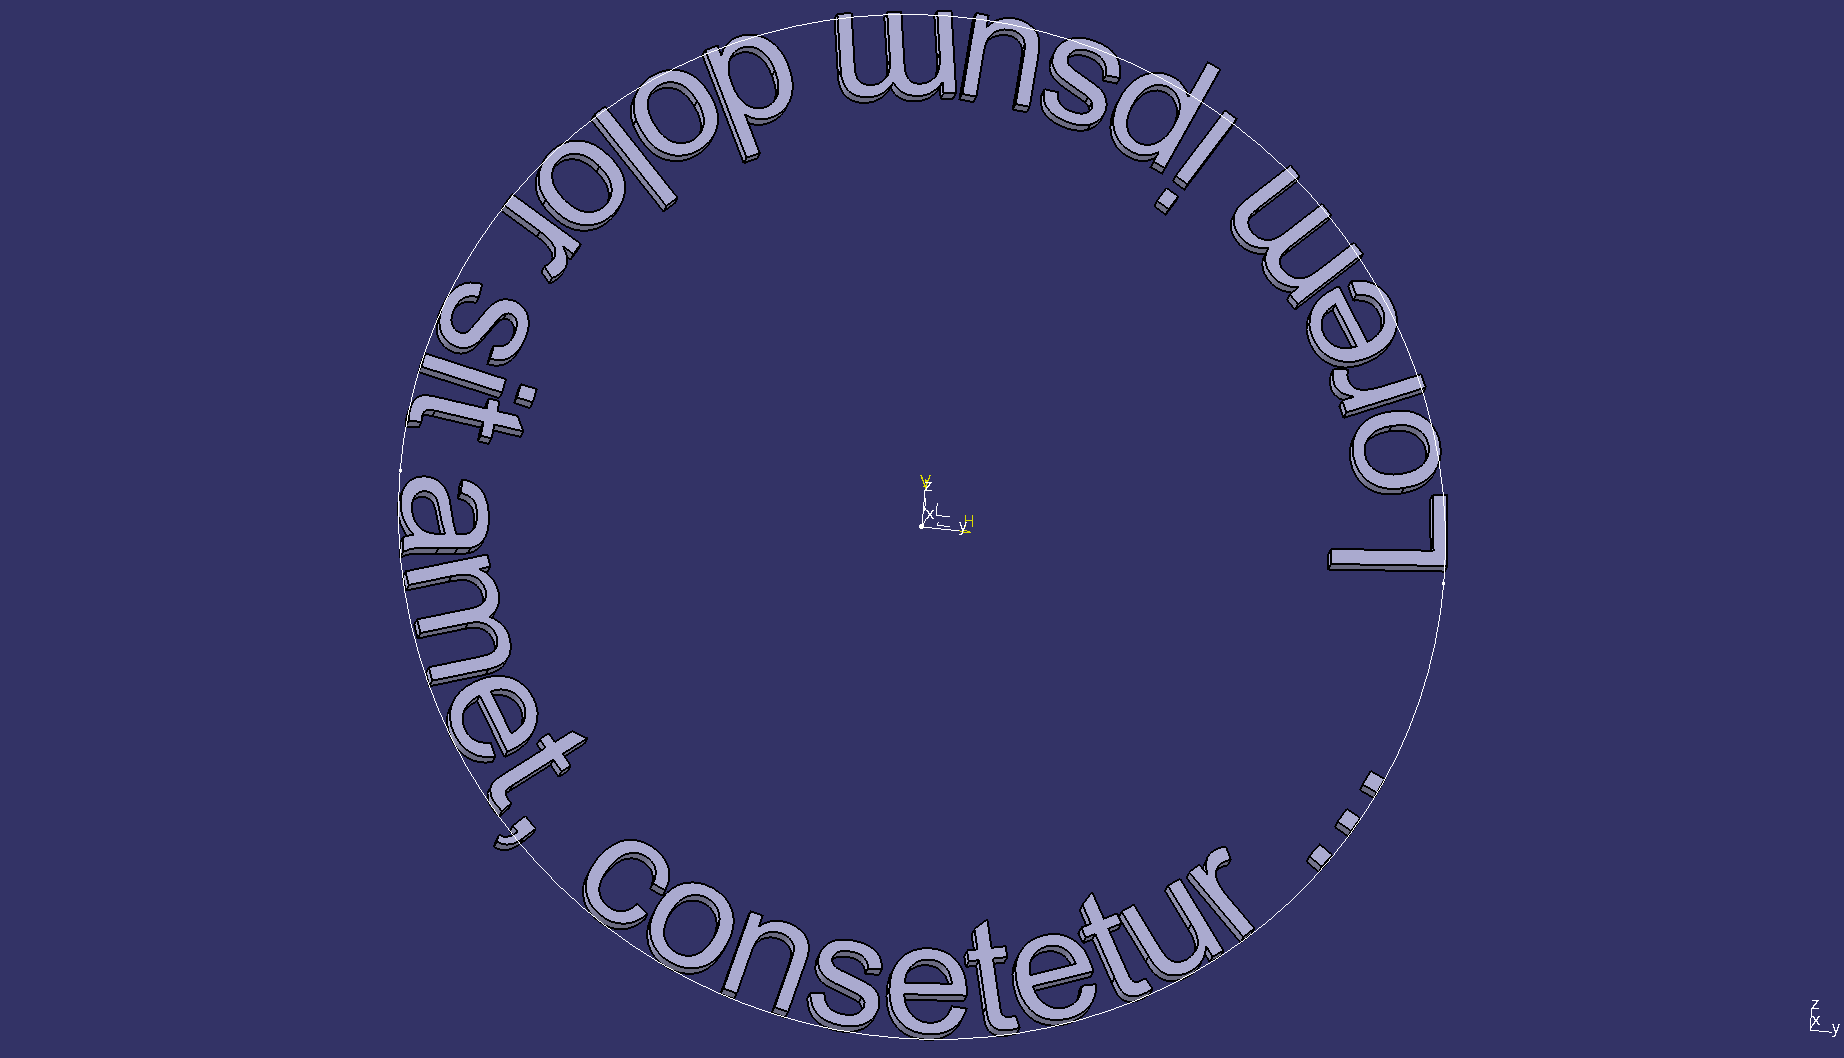 Text on circle